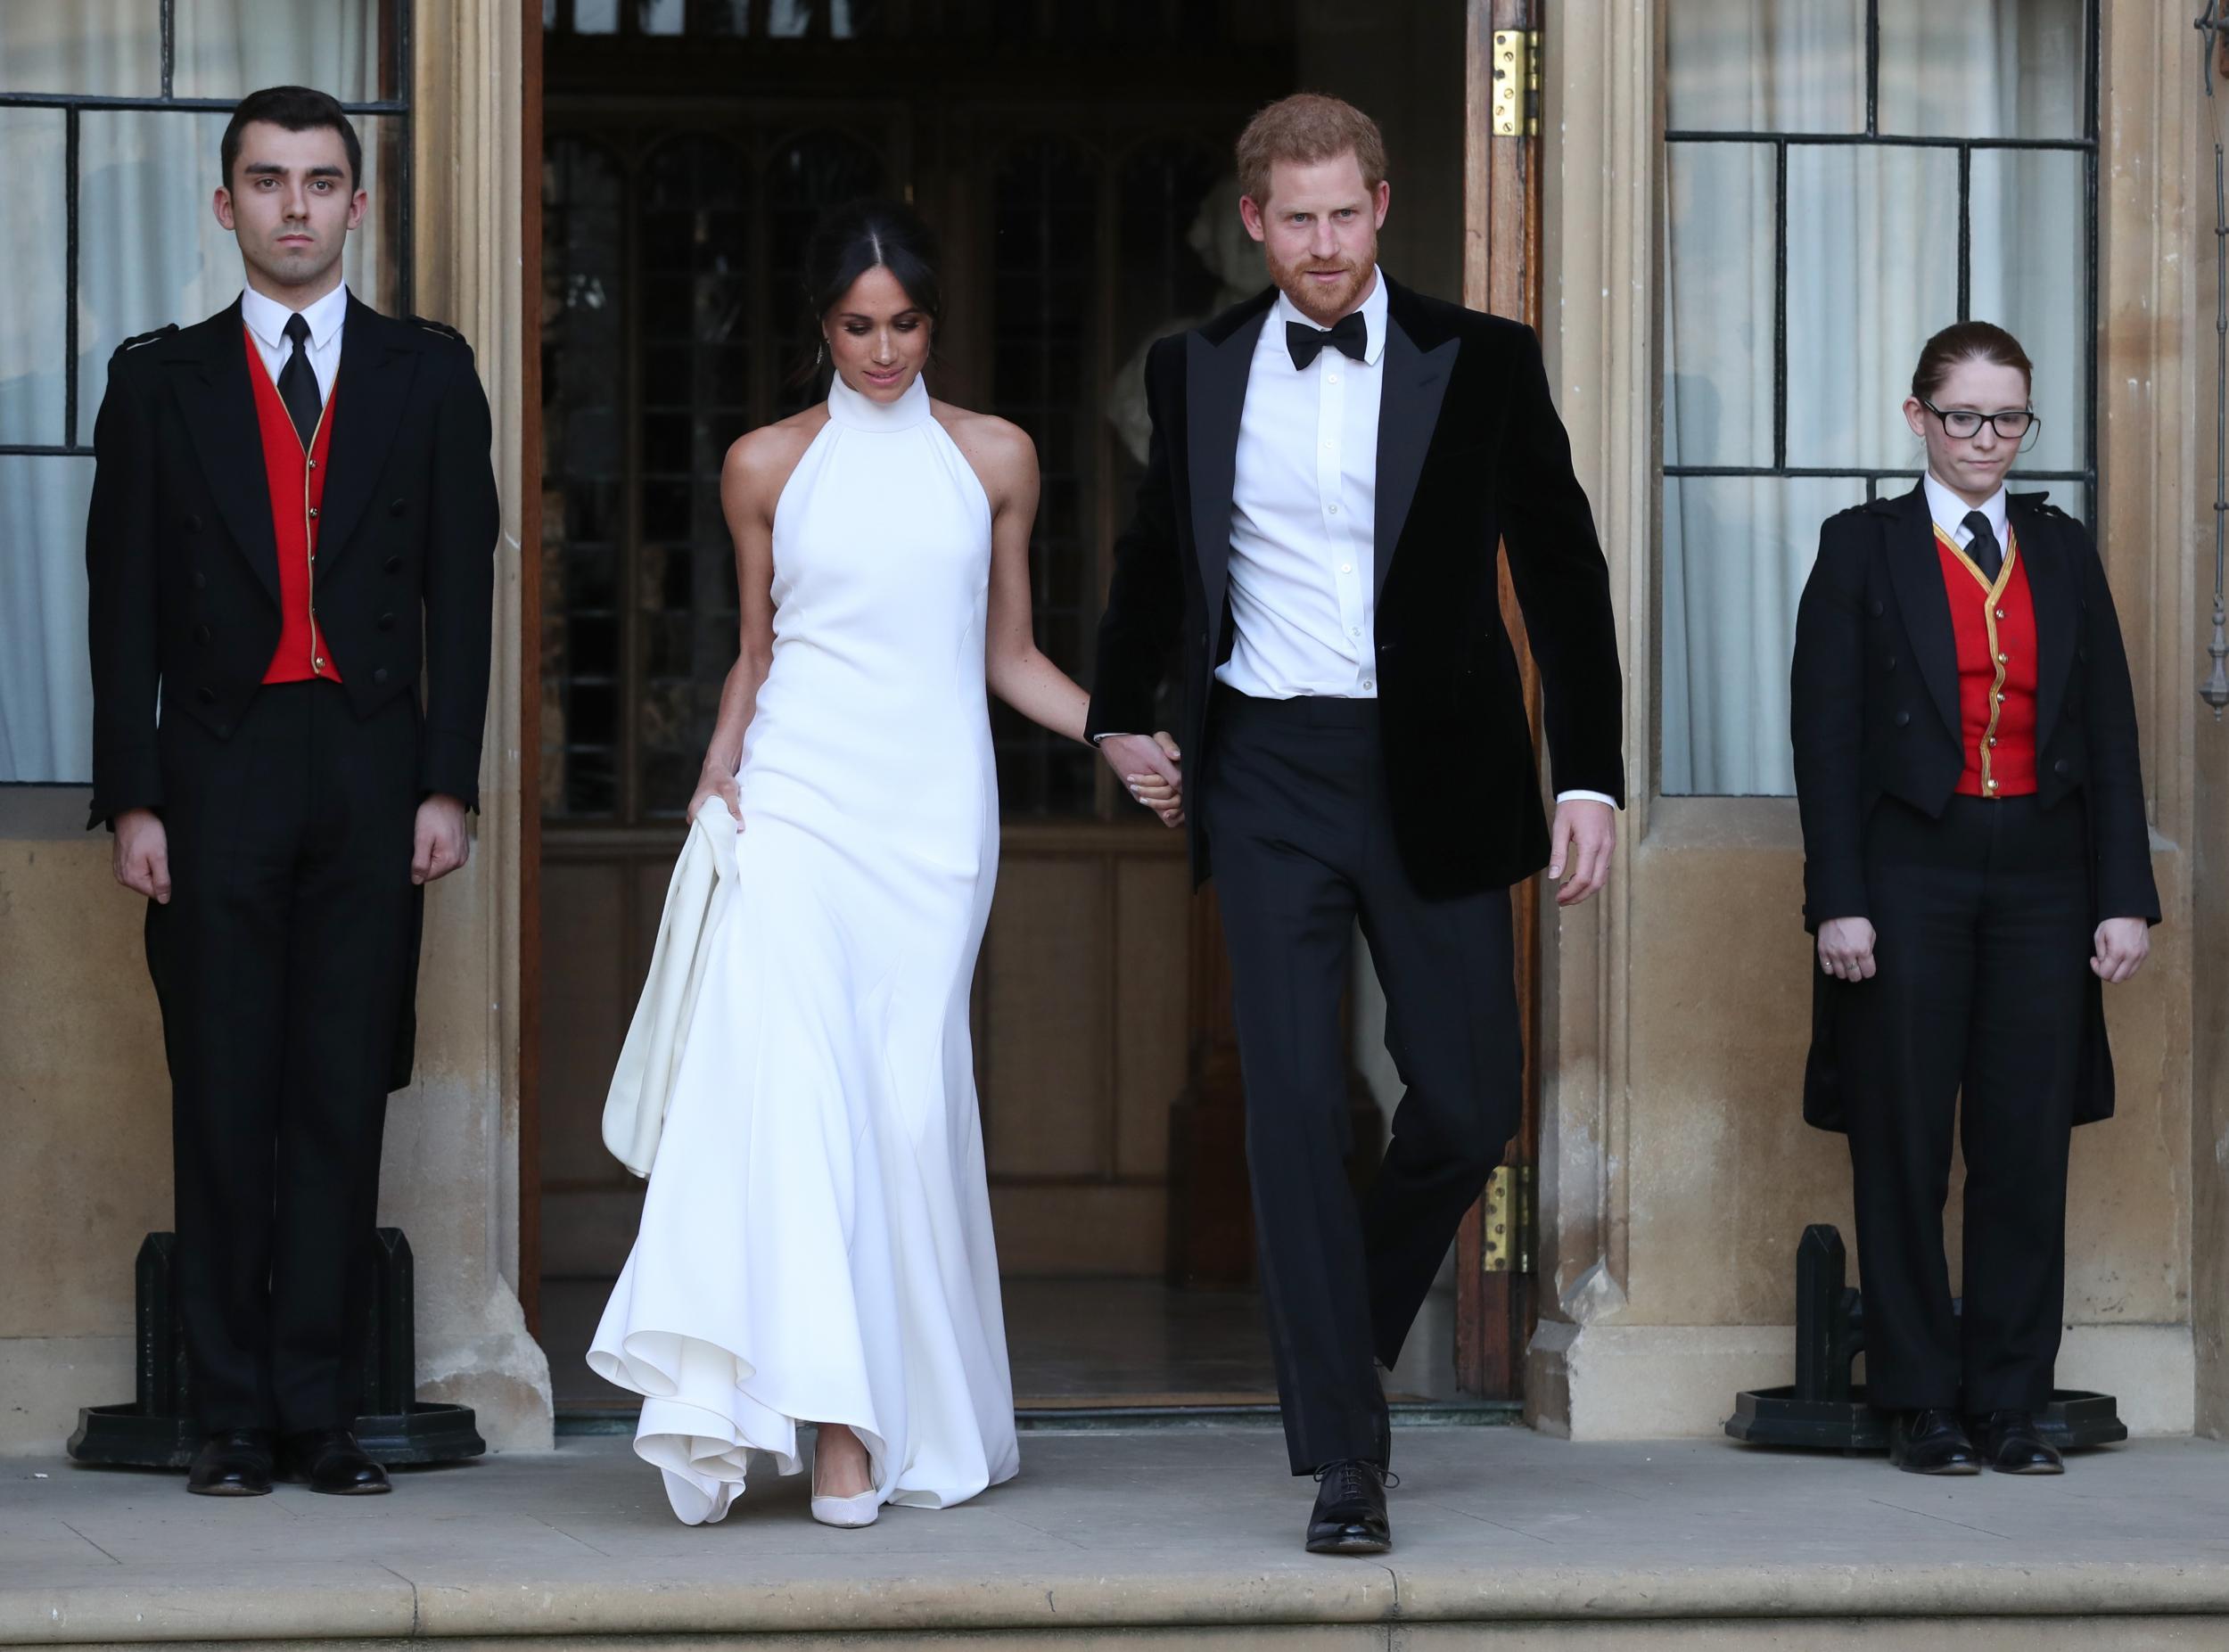 6 - Meghan Markle's wedding reception dress, Stella McCartney, 2018